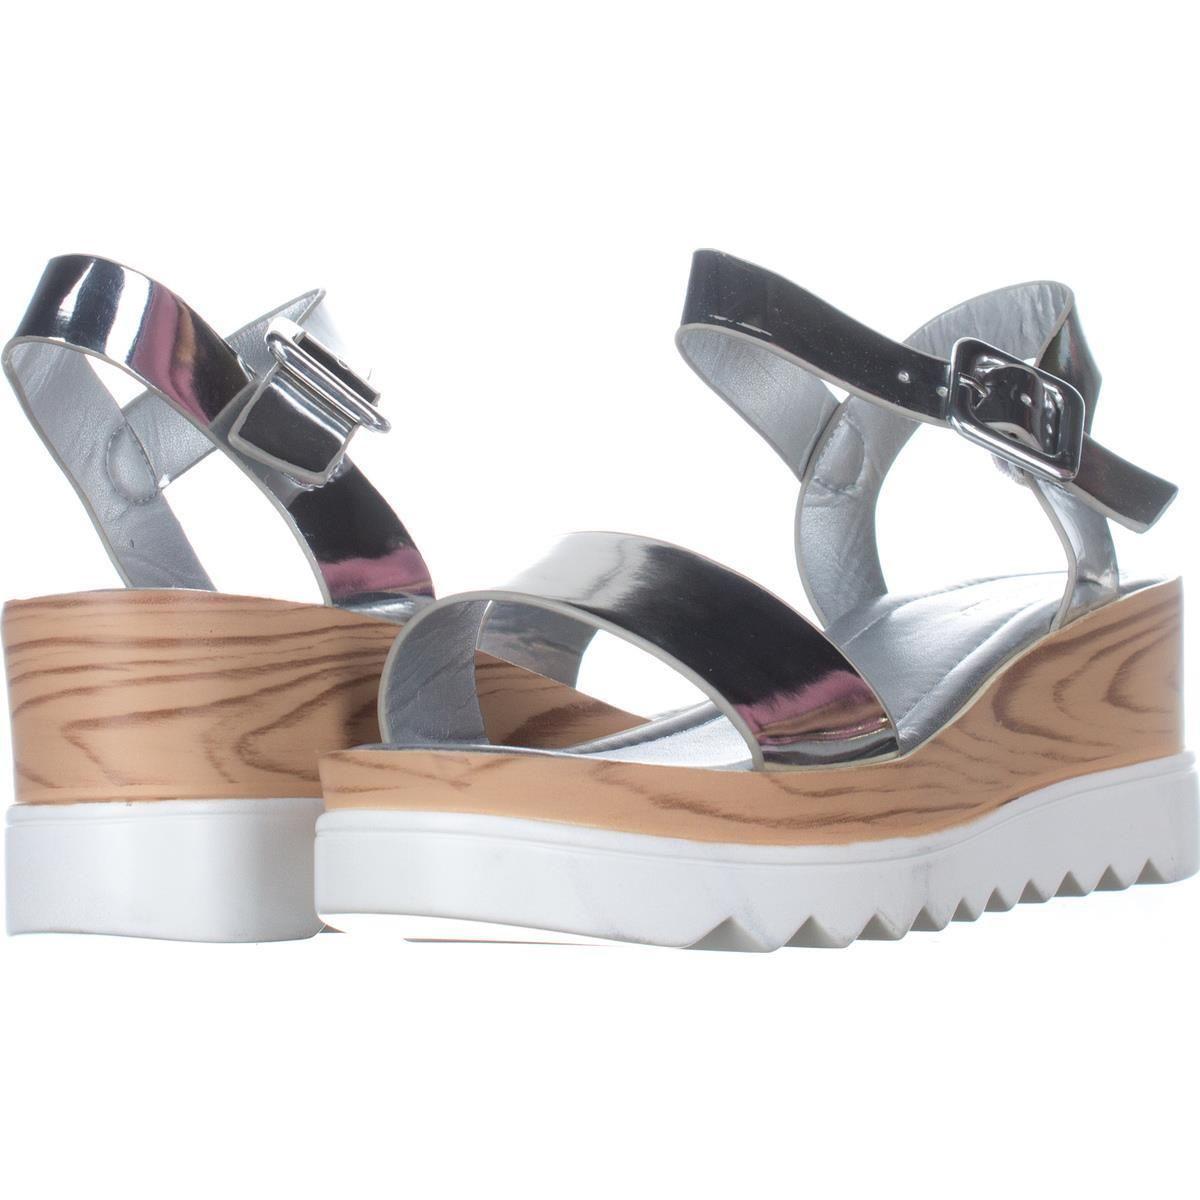 be676b06017 Wanted Baldwin Platform Sandals